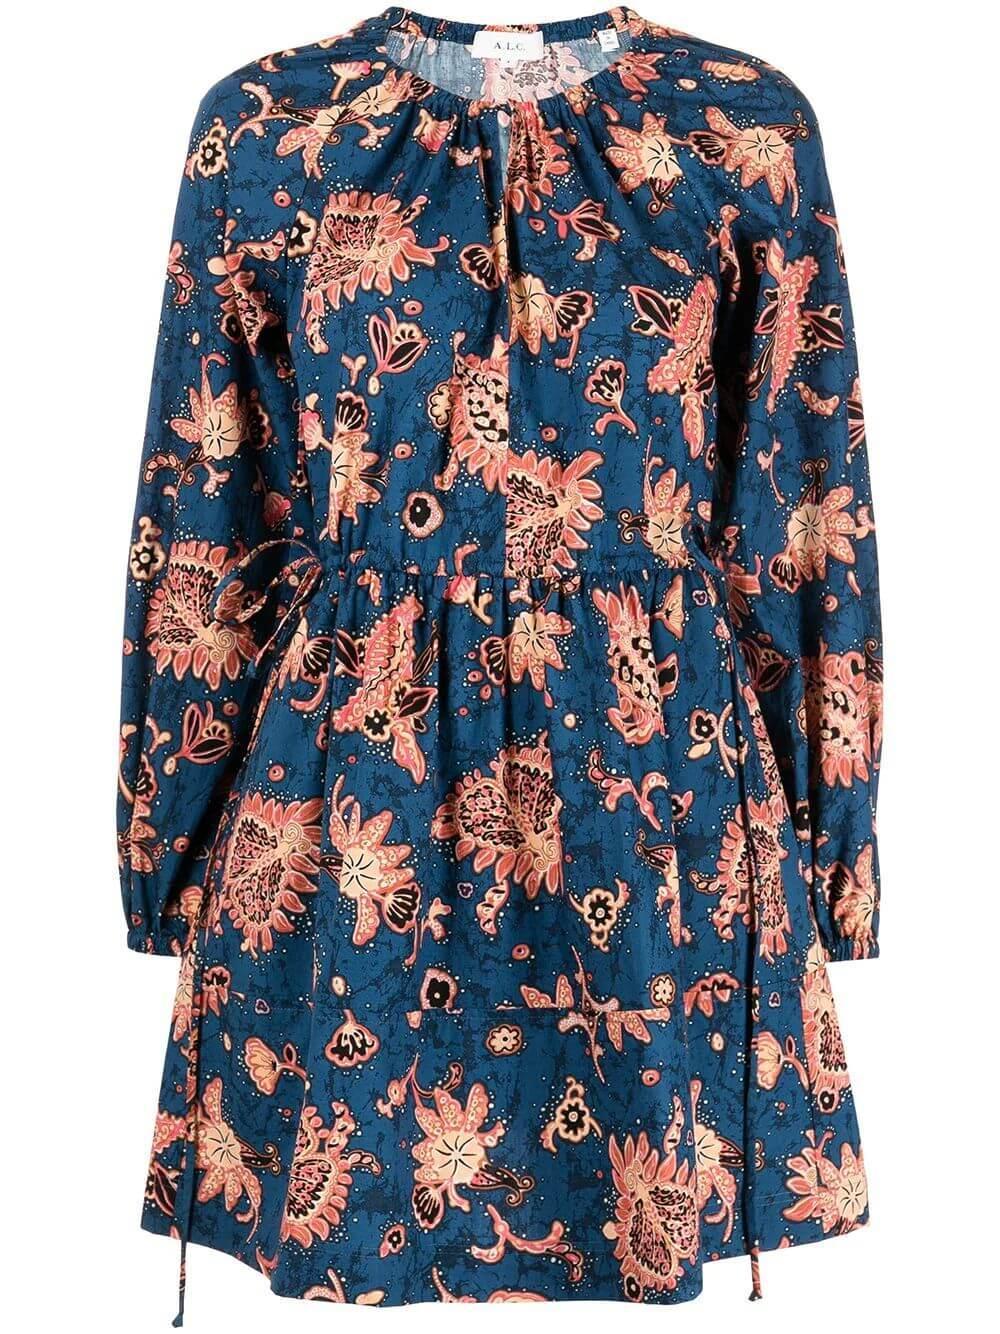 Myra Dress Item # 6DRES01250